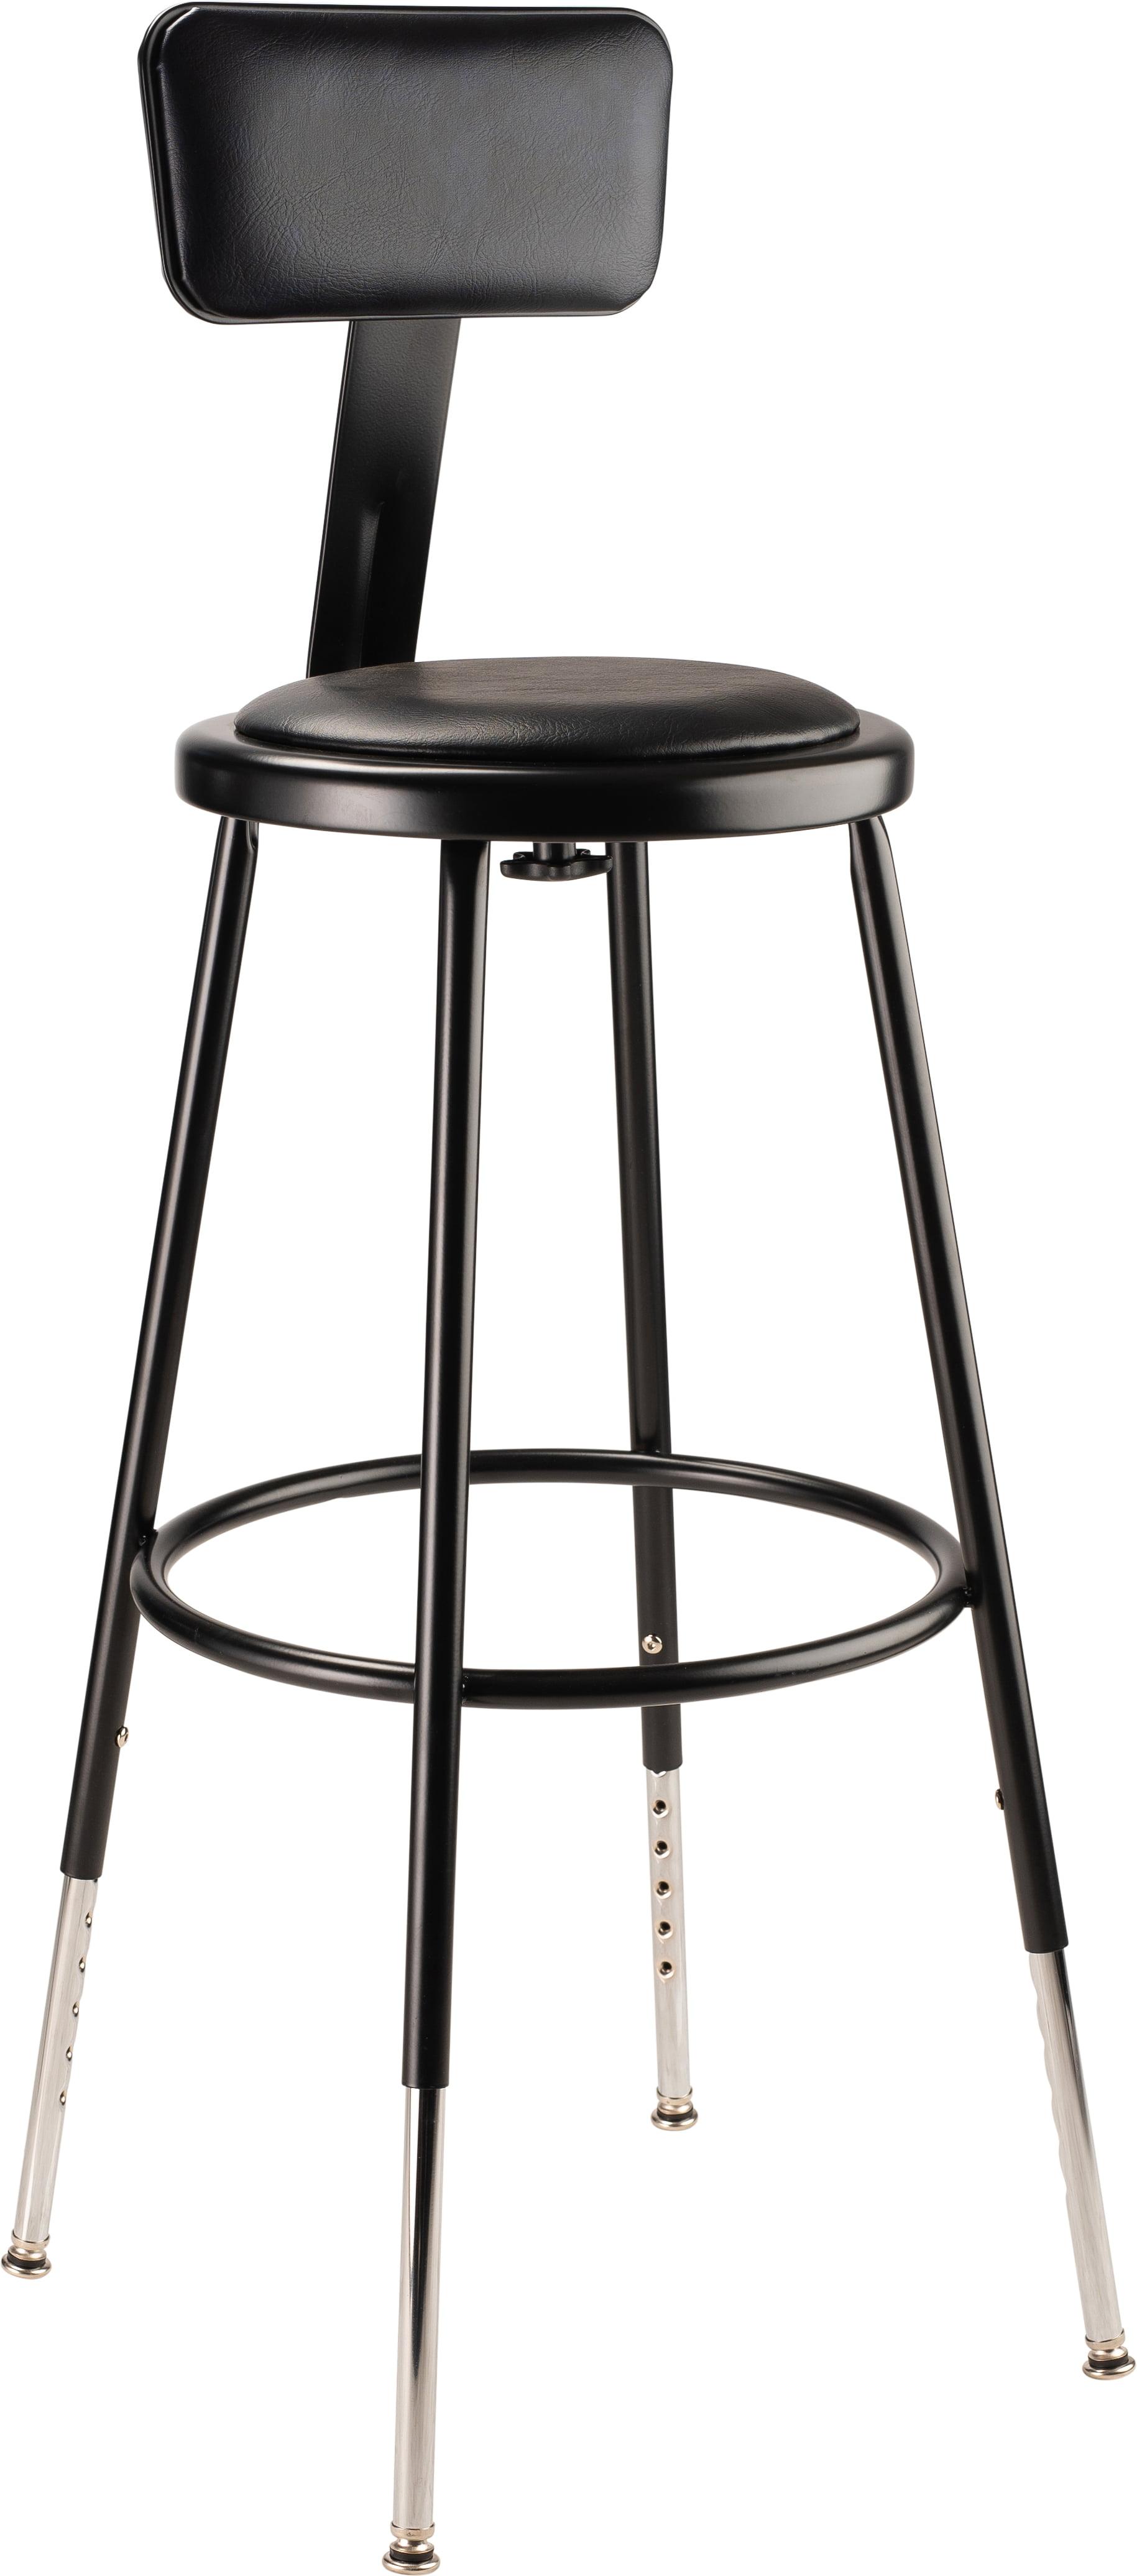 Nps 24 Adjustable Height Heavy Duty Vinyl Padded Steel Stool With Backrest Black Walmart Com Walmart Com